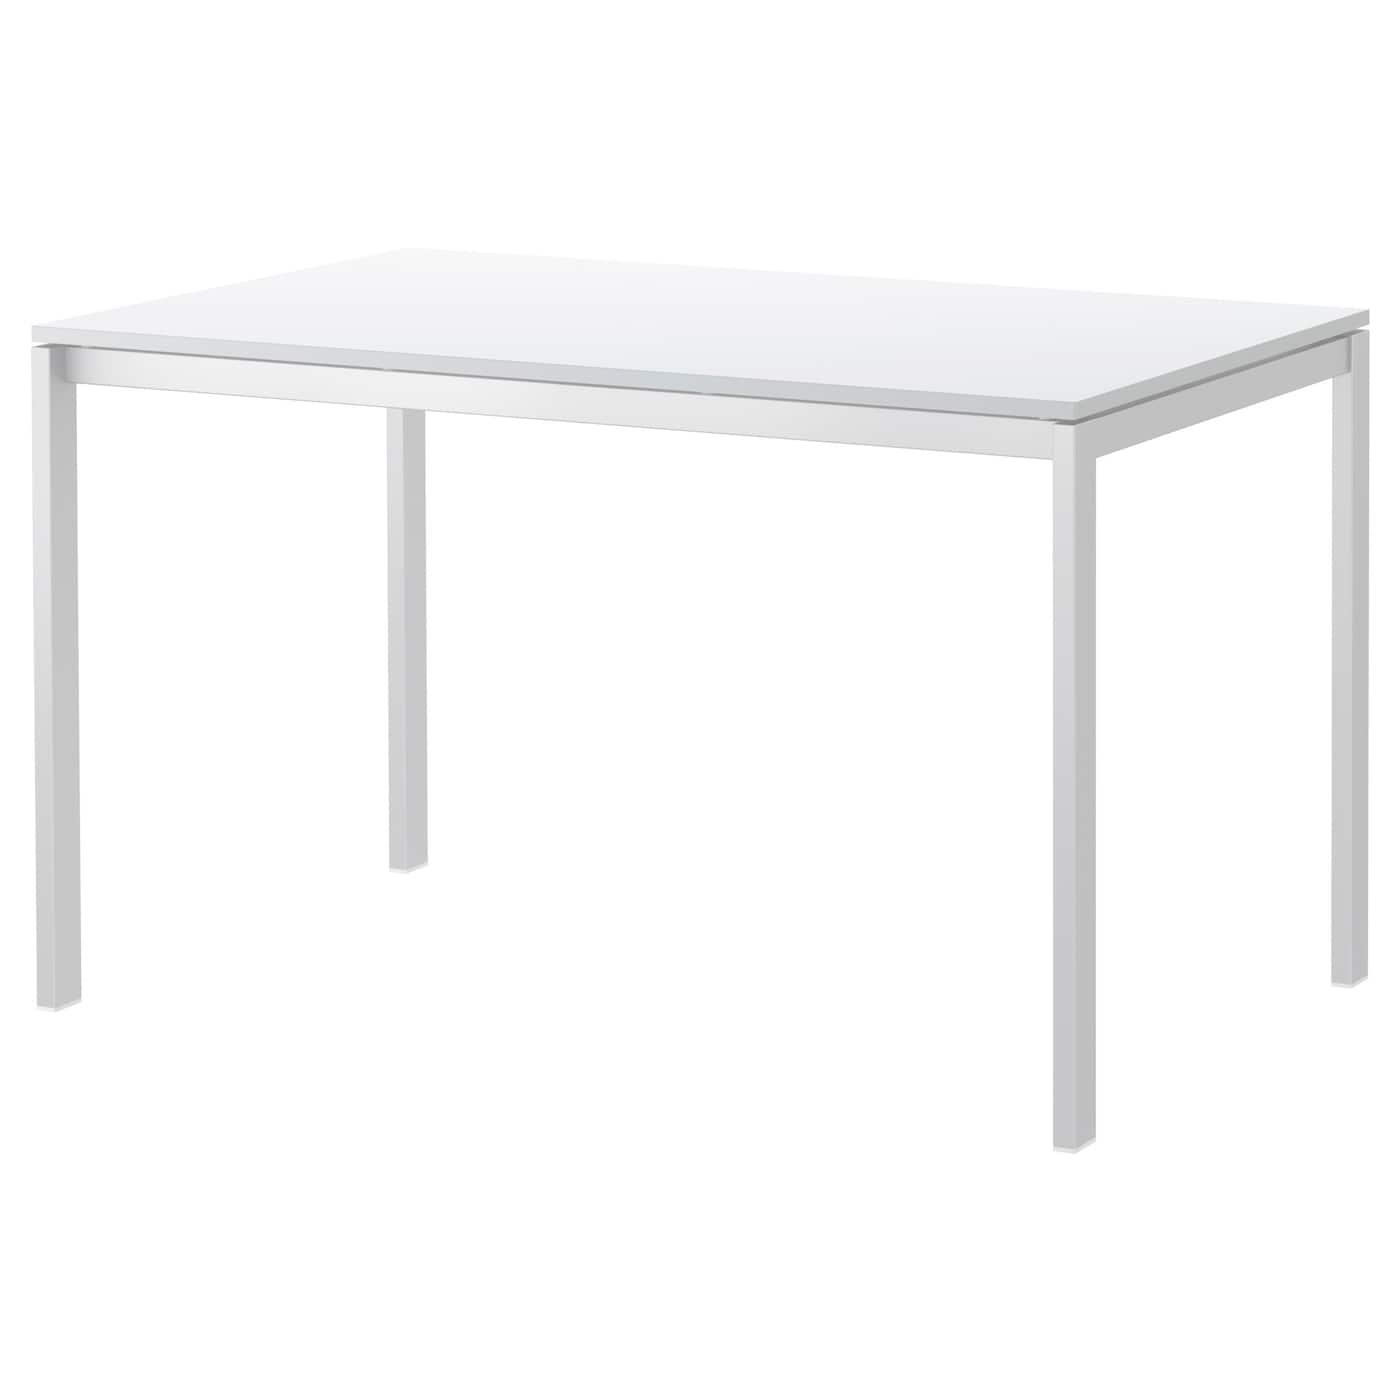 Witte Ronde Keukentafel.Eettafels Kopen Keukentafel Eetkamertafel Ikea